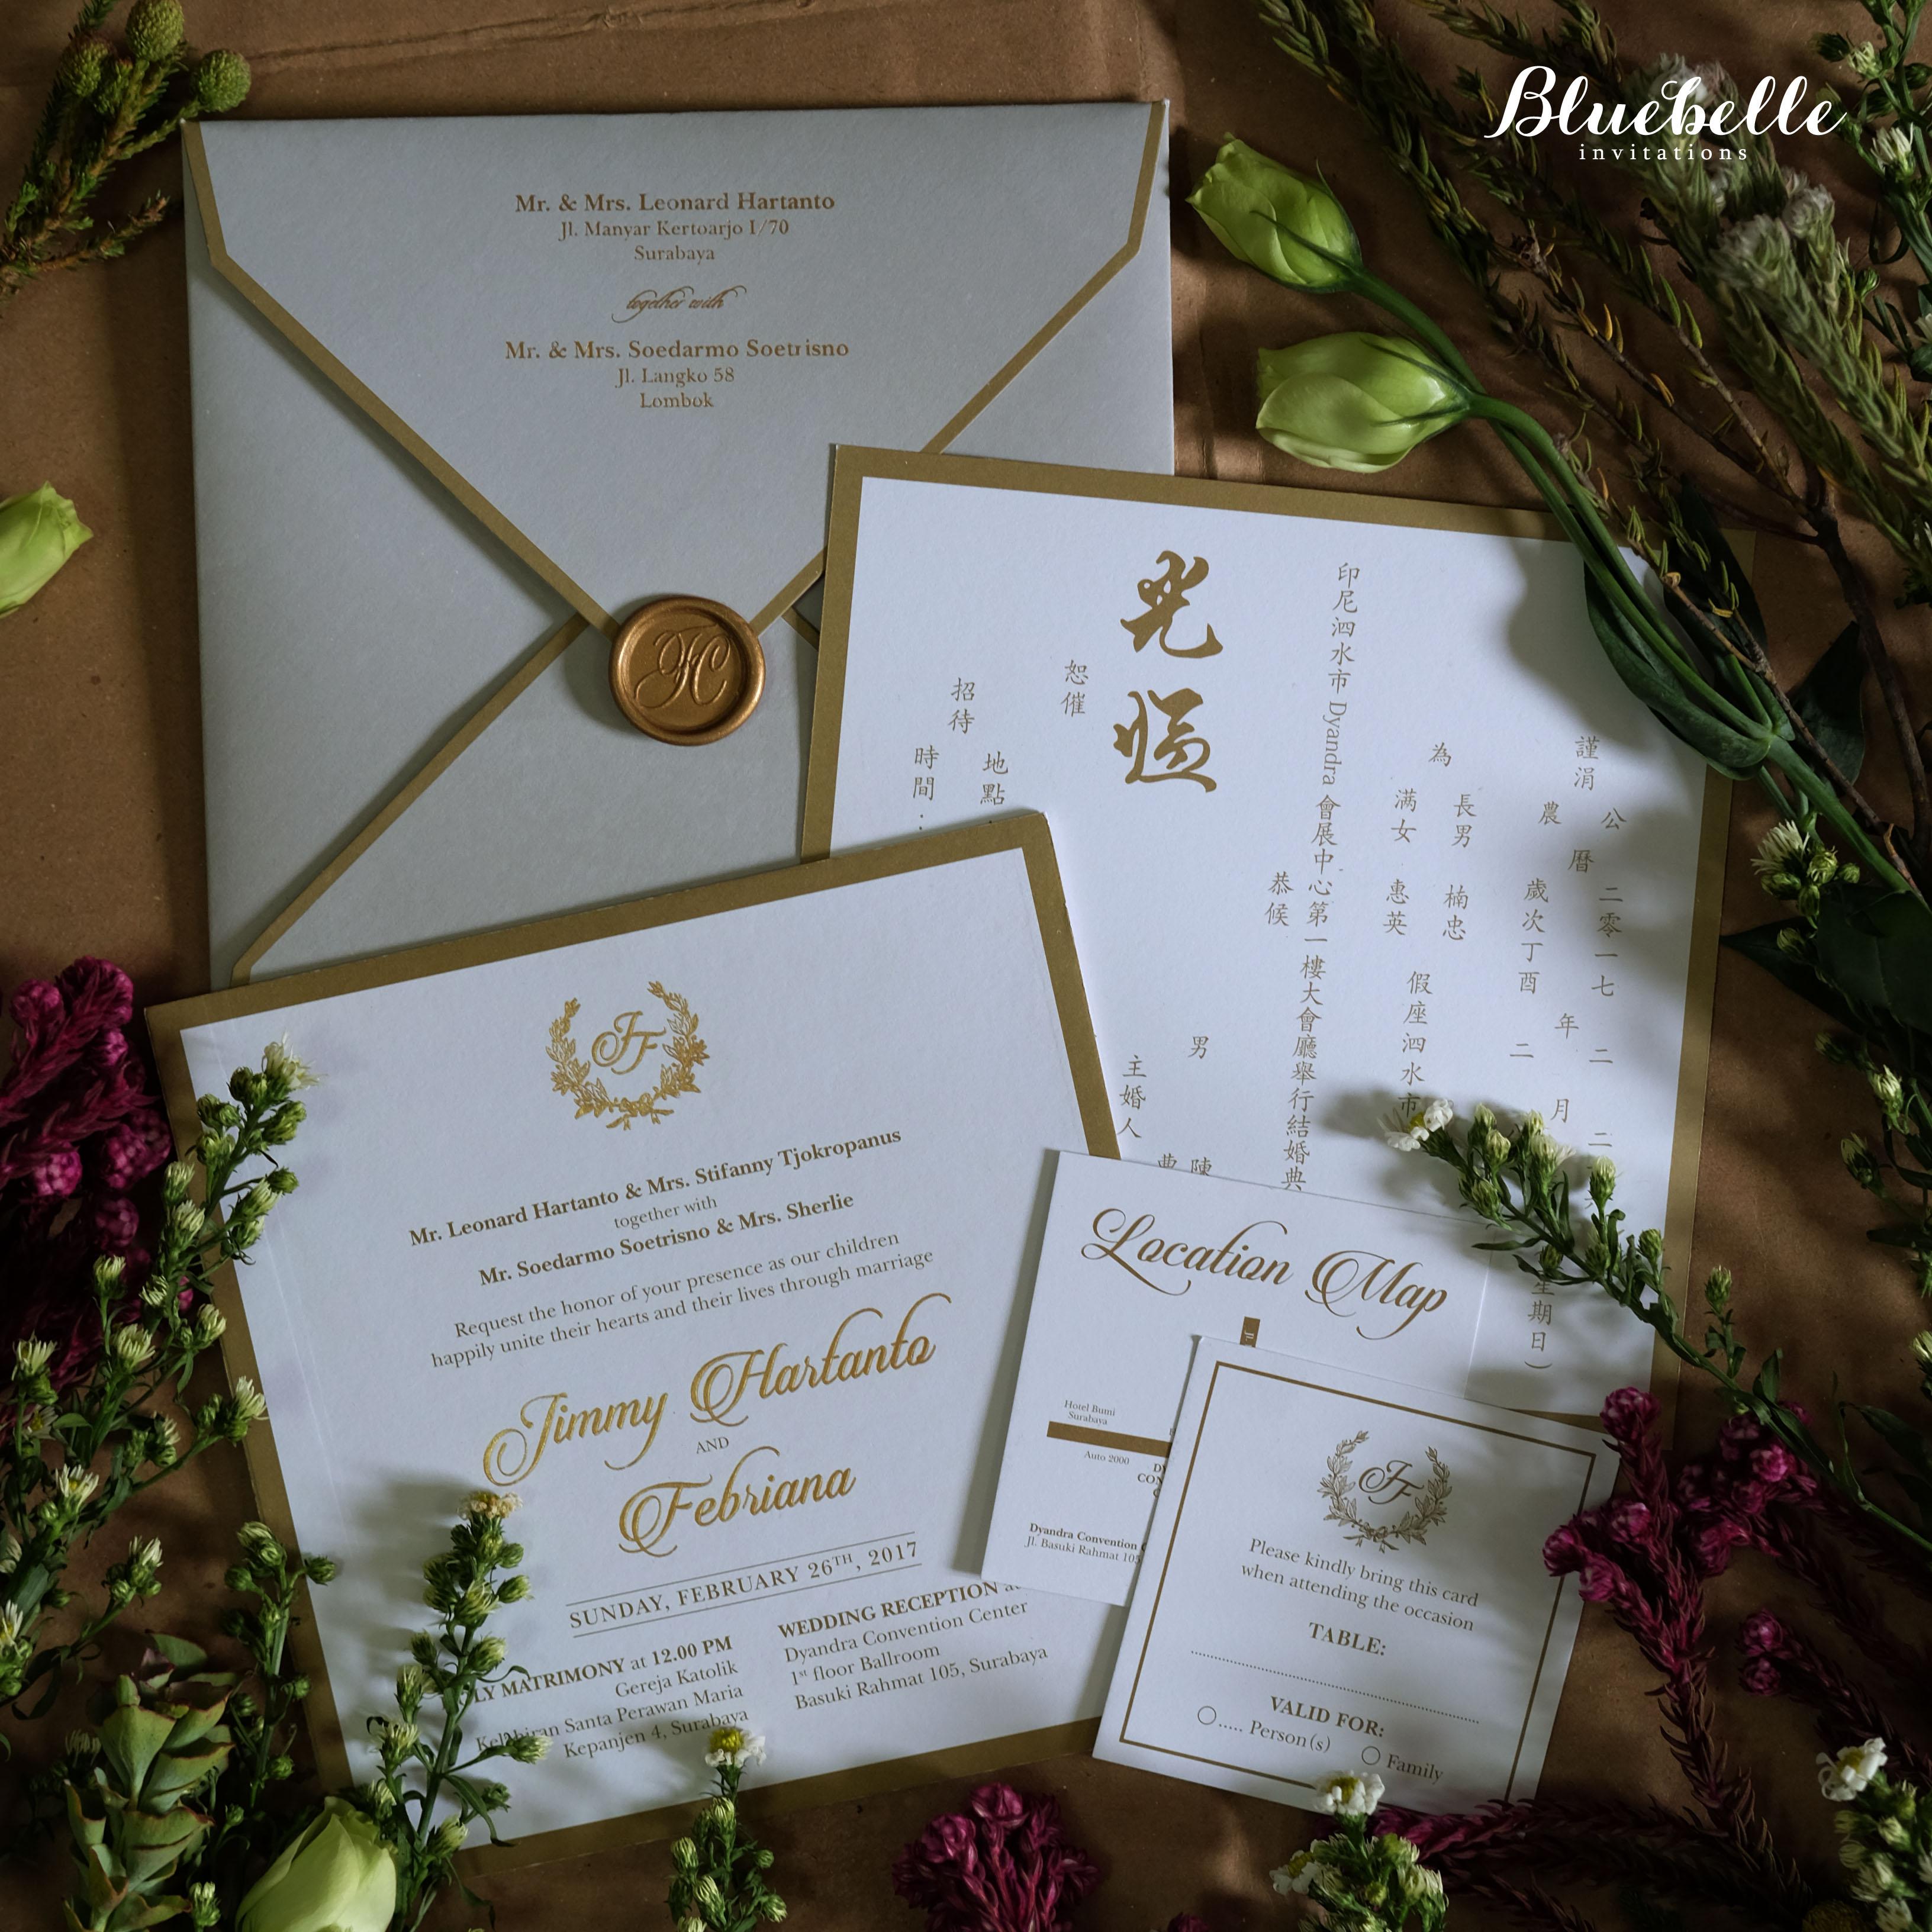 Jimmy febriana classic elegant grey wedding invitation by jimmy febriana classic elegant grey wedding invitation by bluebelle invitations bridestory stopboris Gallery